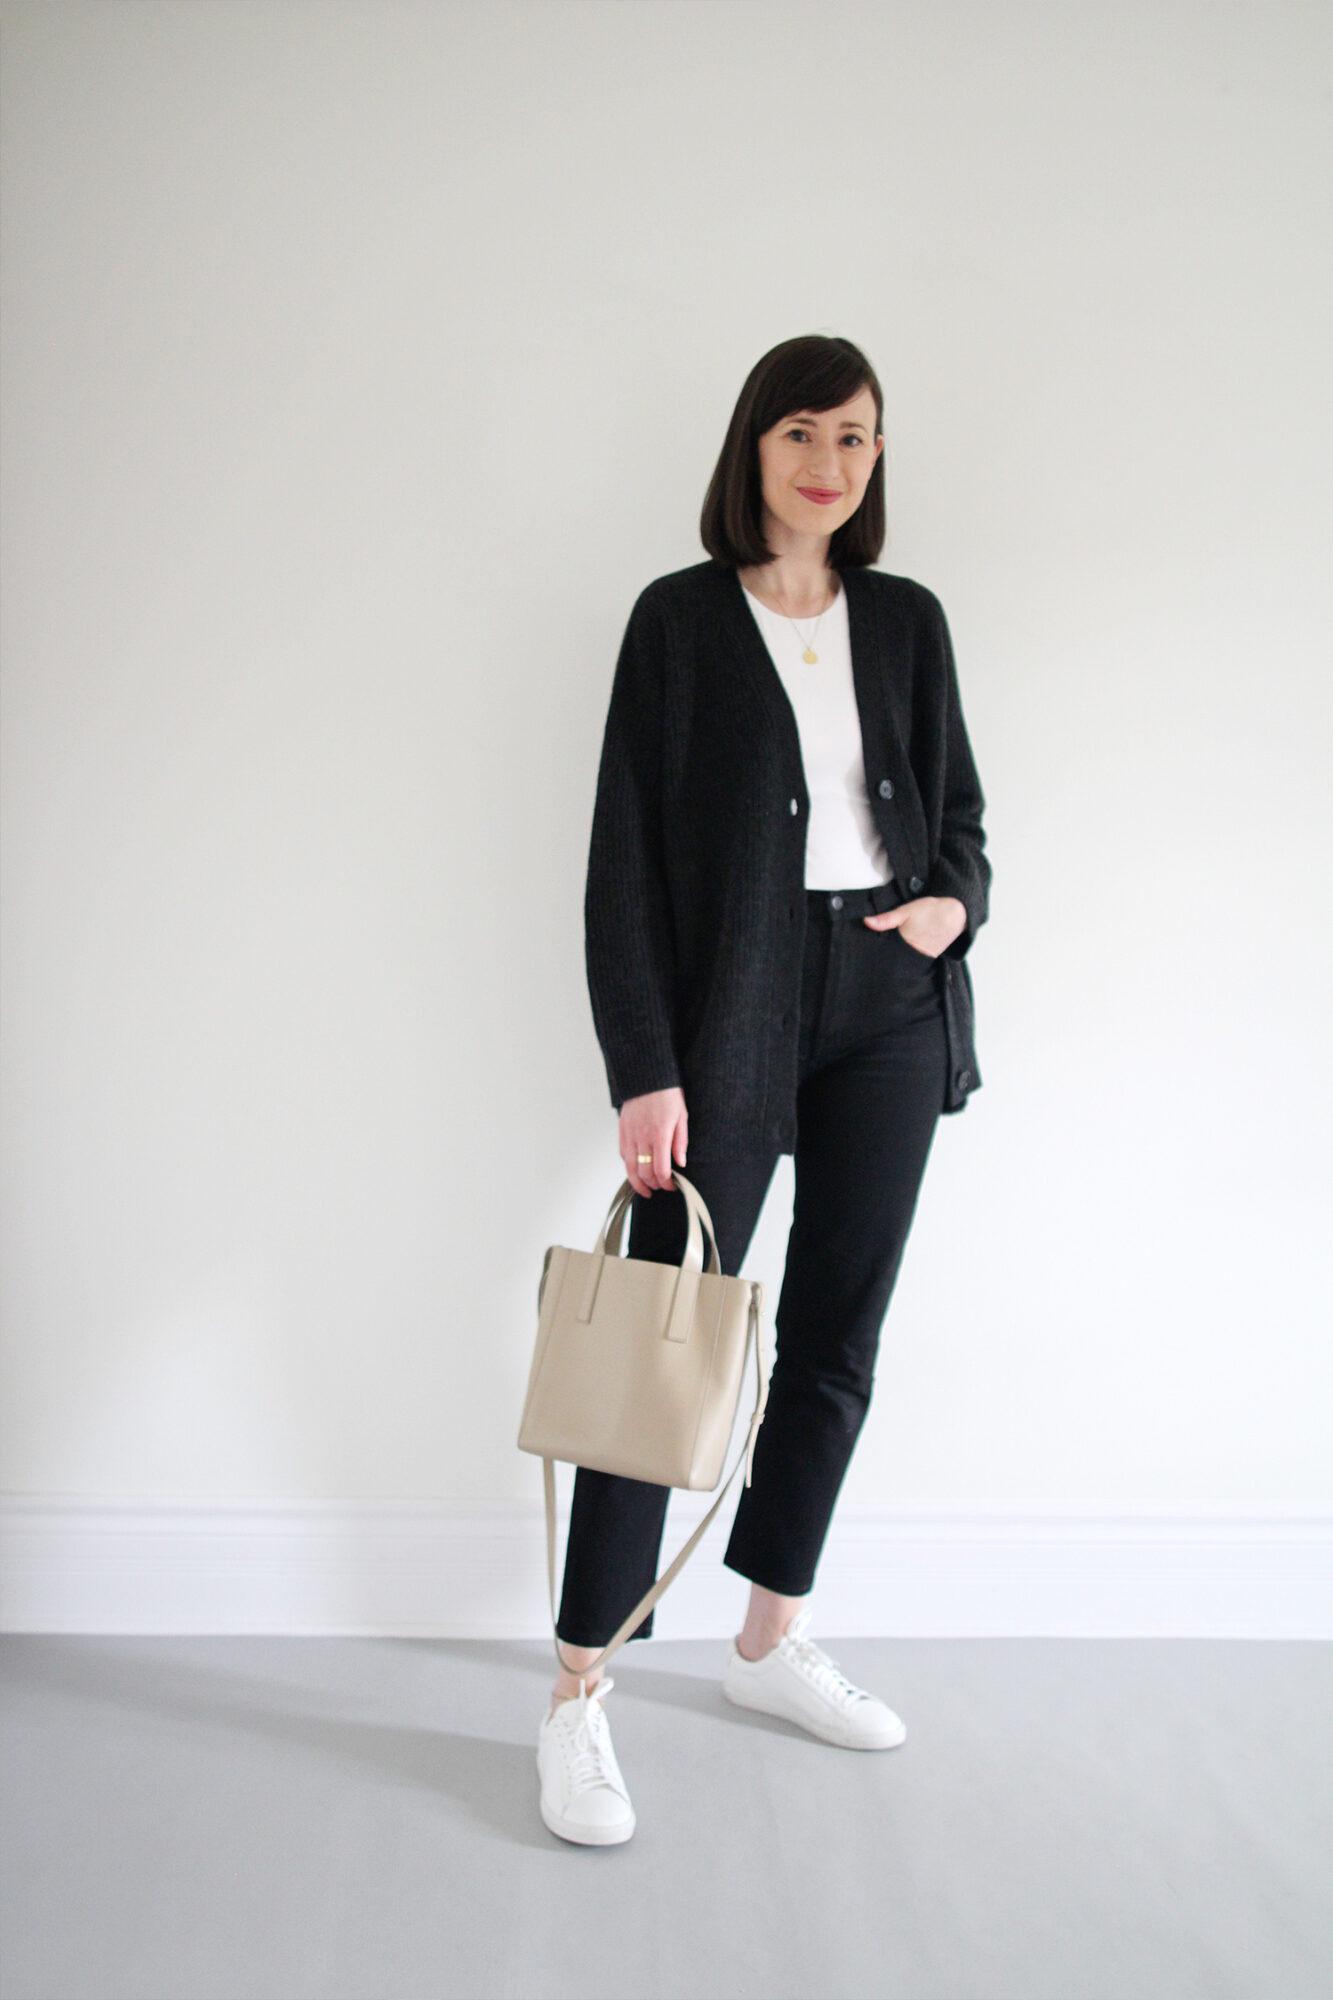 Style Bee - Early Fall Uniform